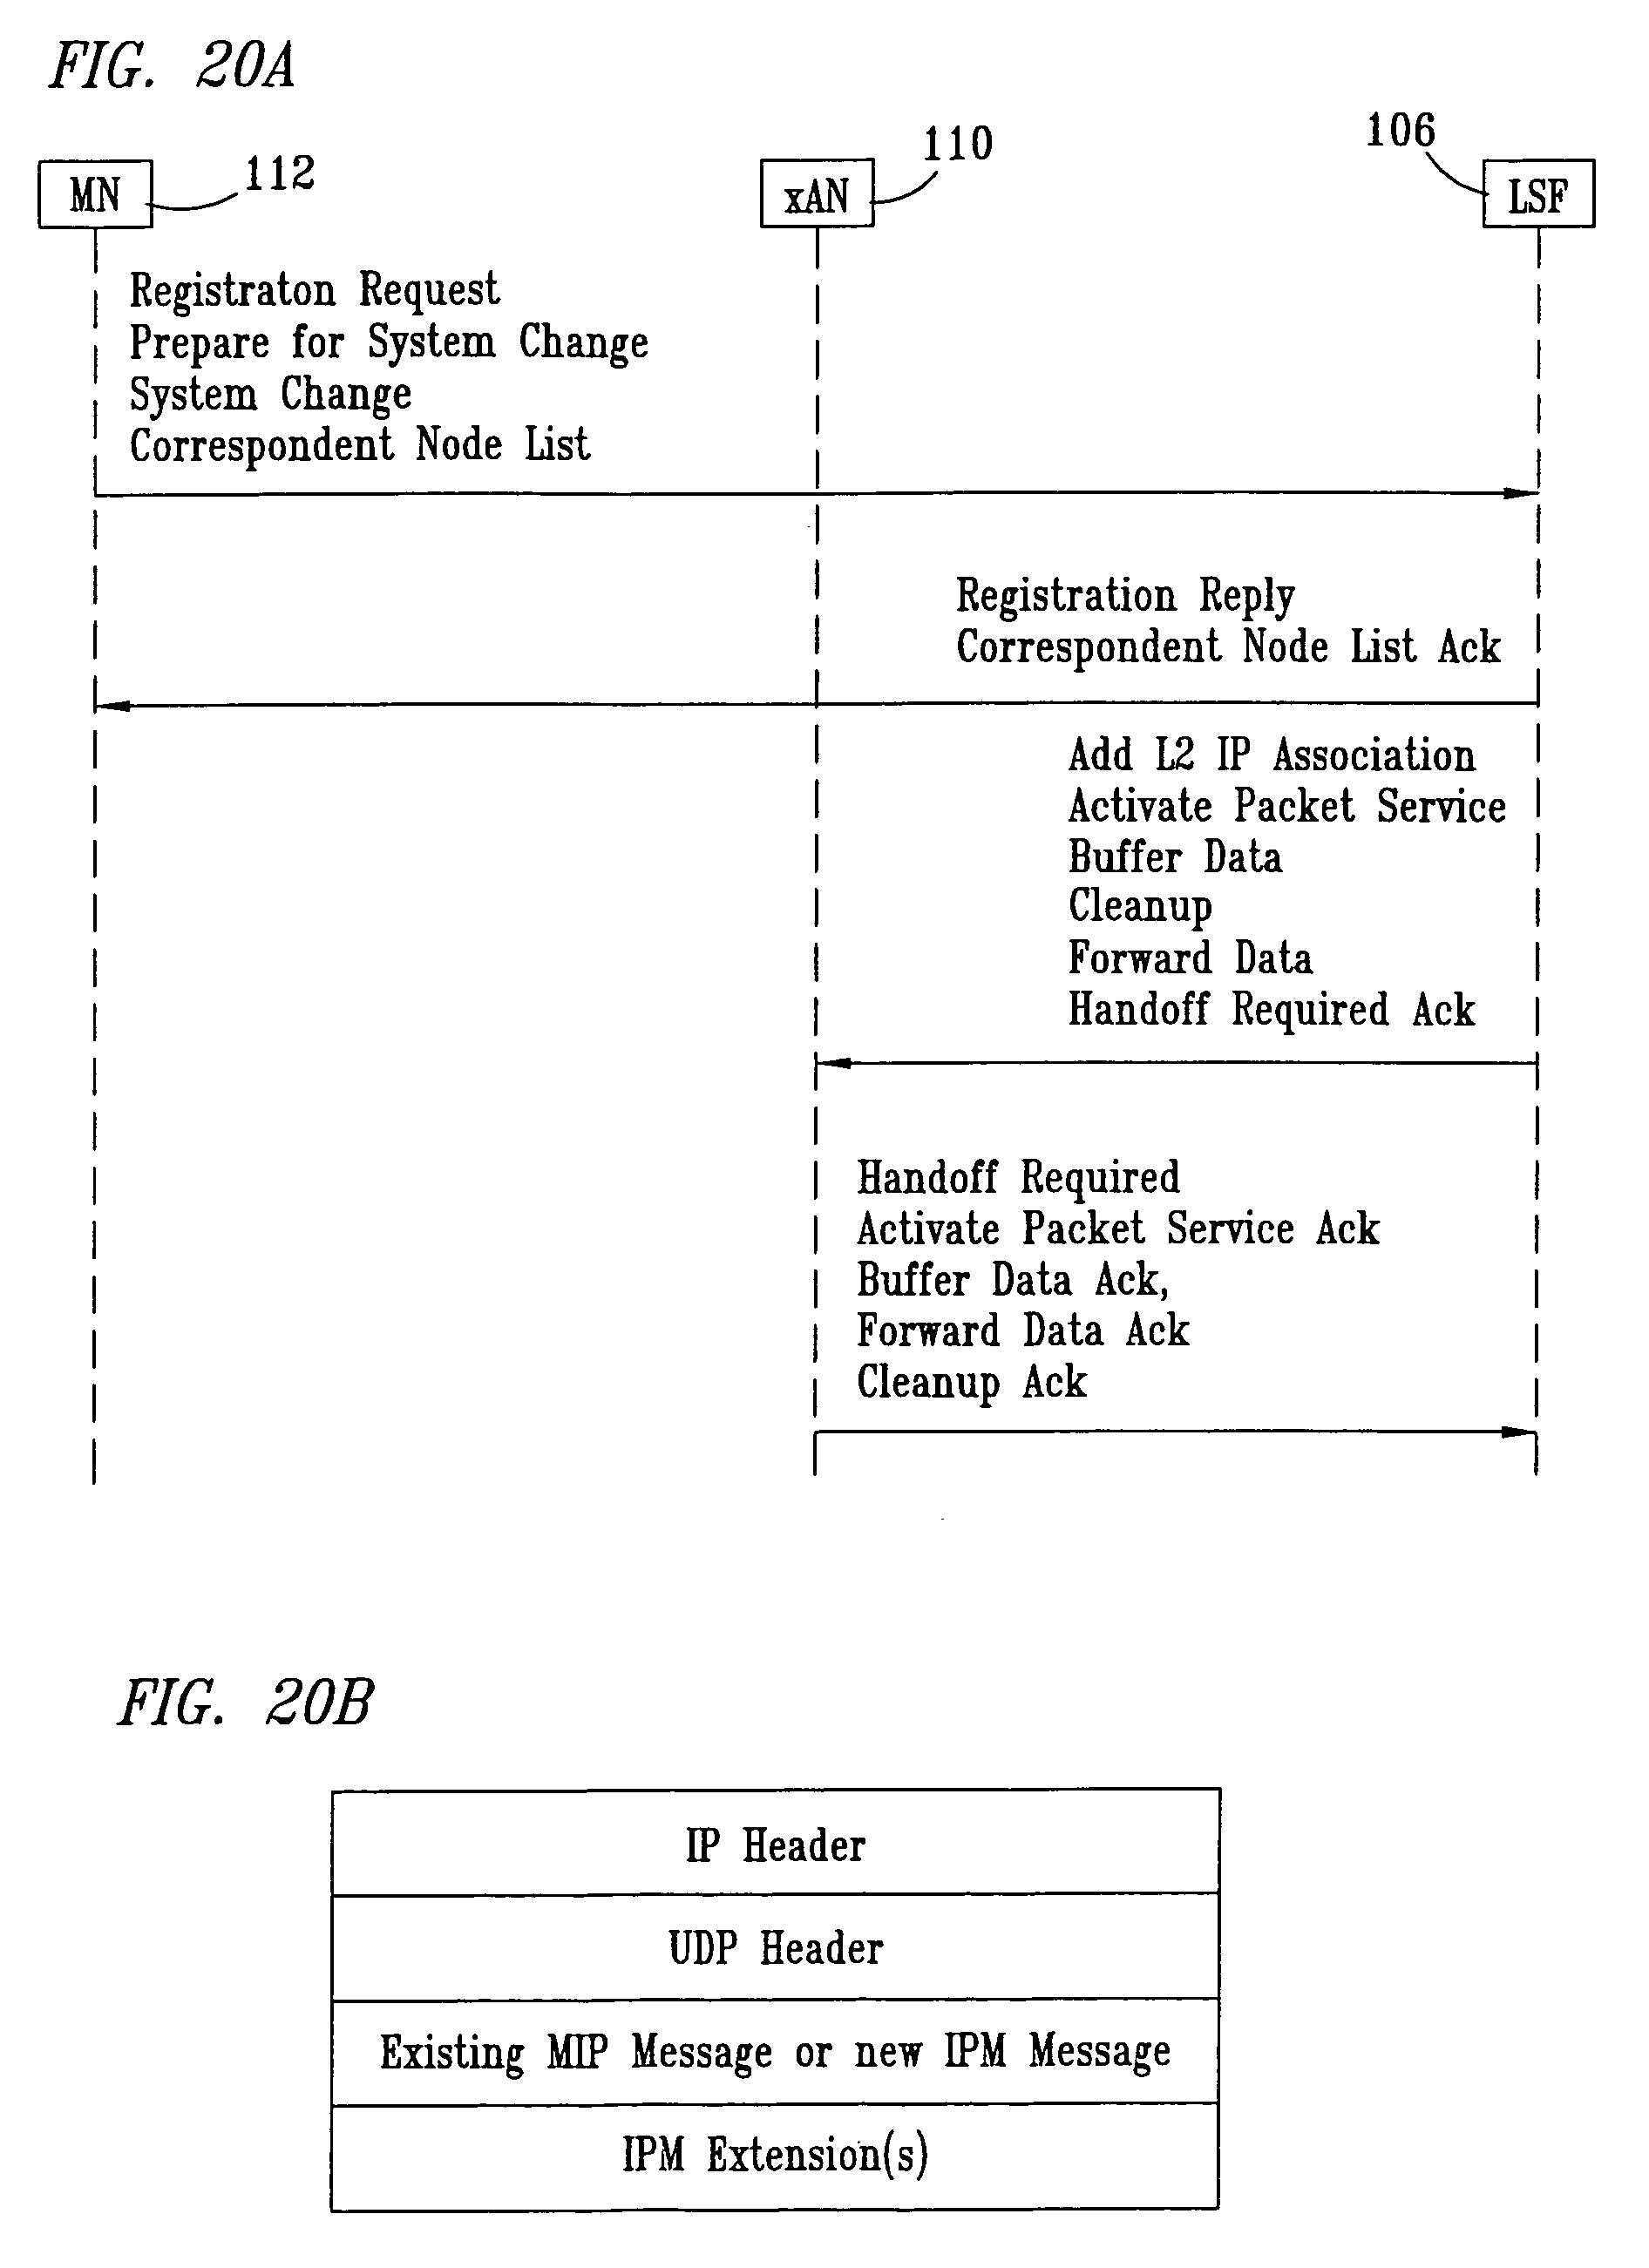 Patent US 7,079,499 B1